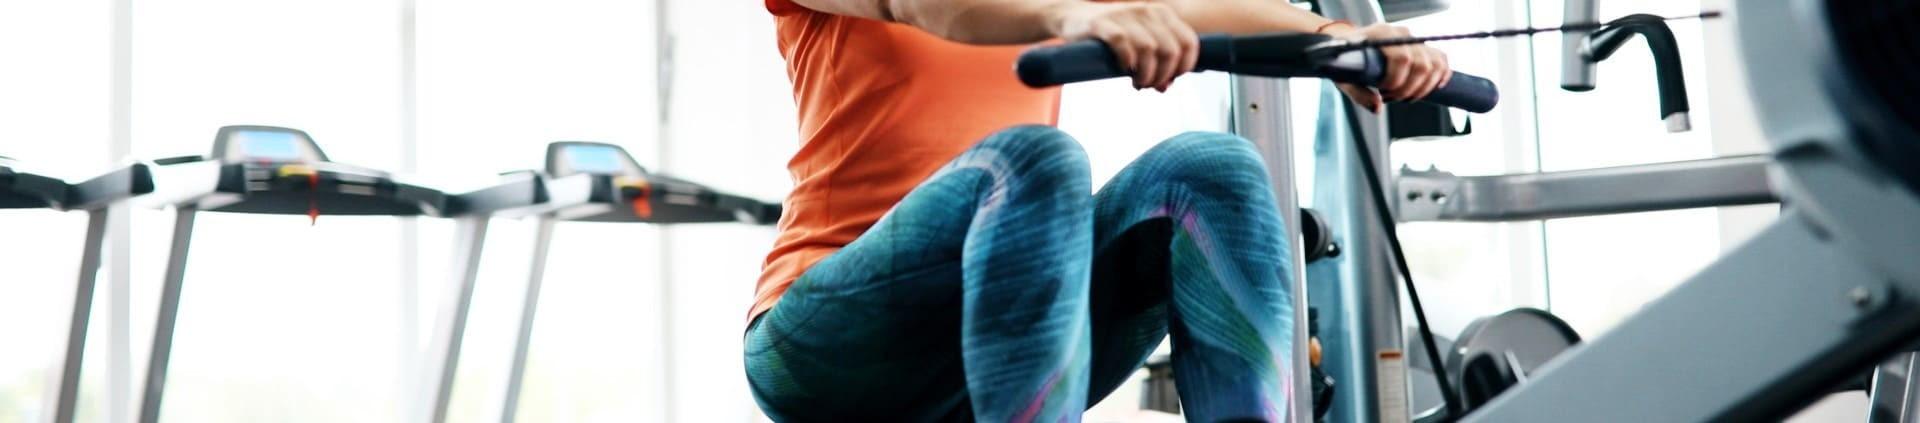 Rowery treningowe do siłowni - ergometry - Powerman Sport